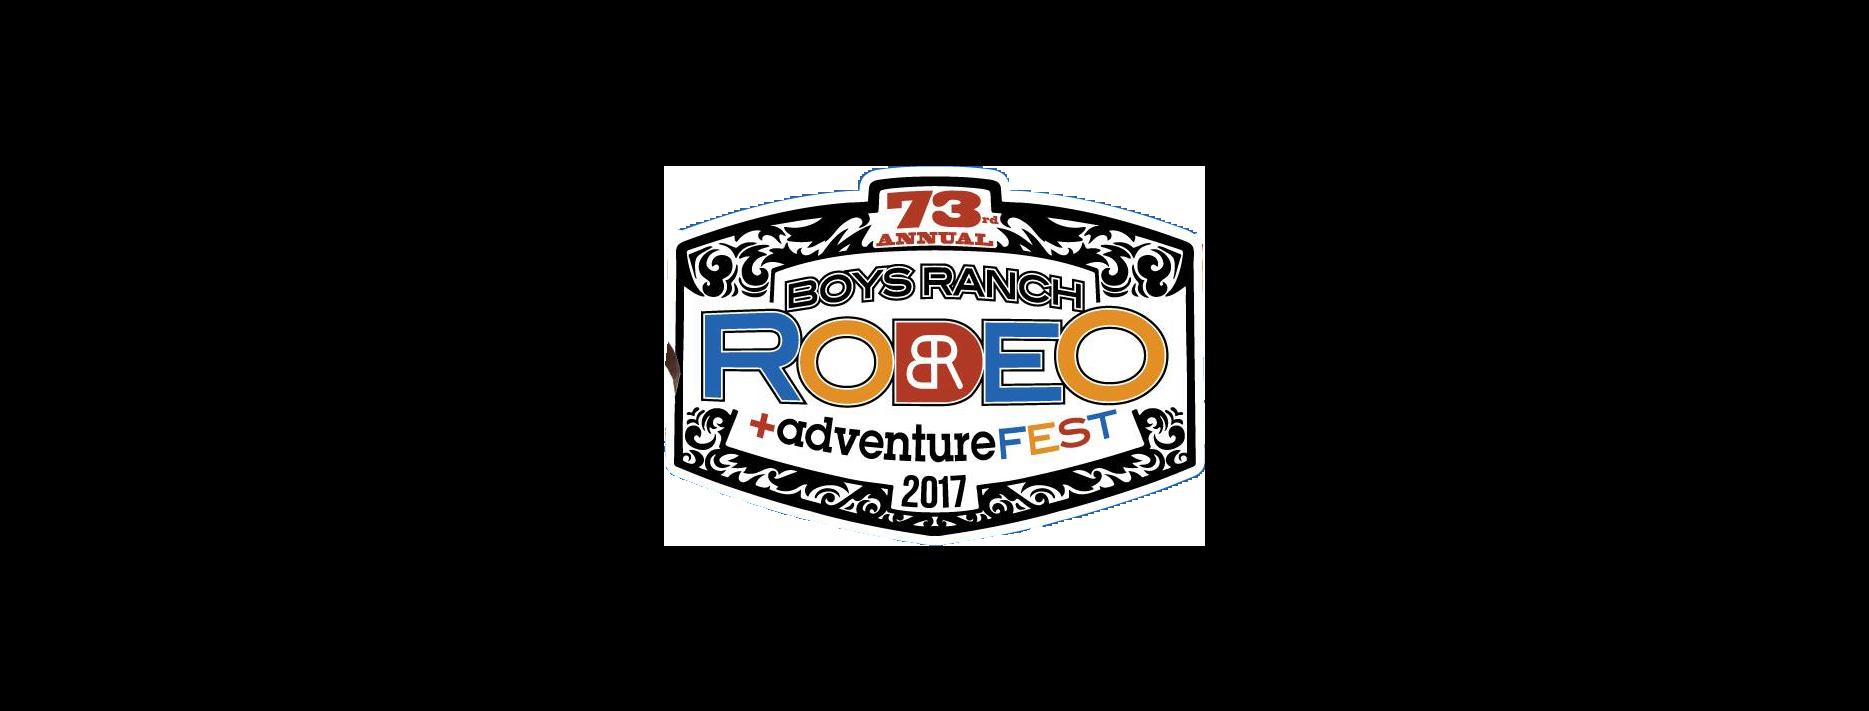 Boys Ranch logo_1504315507321.png